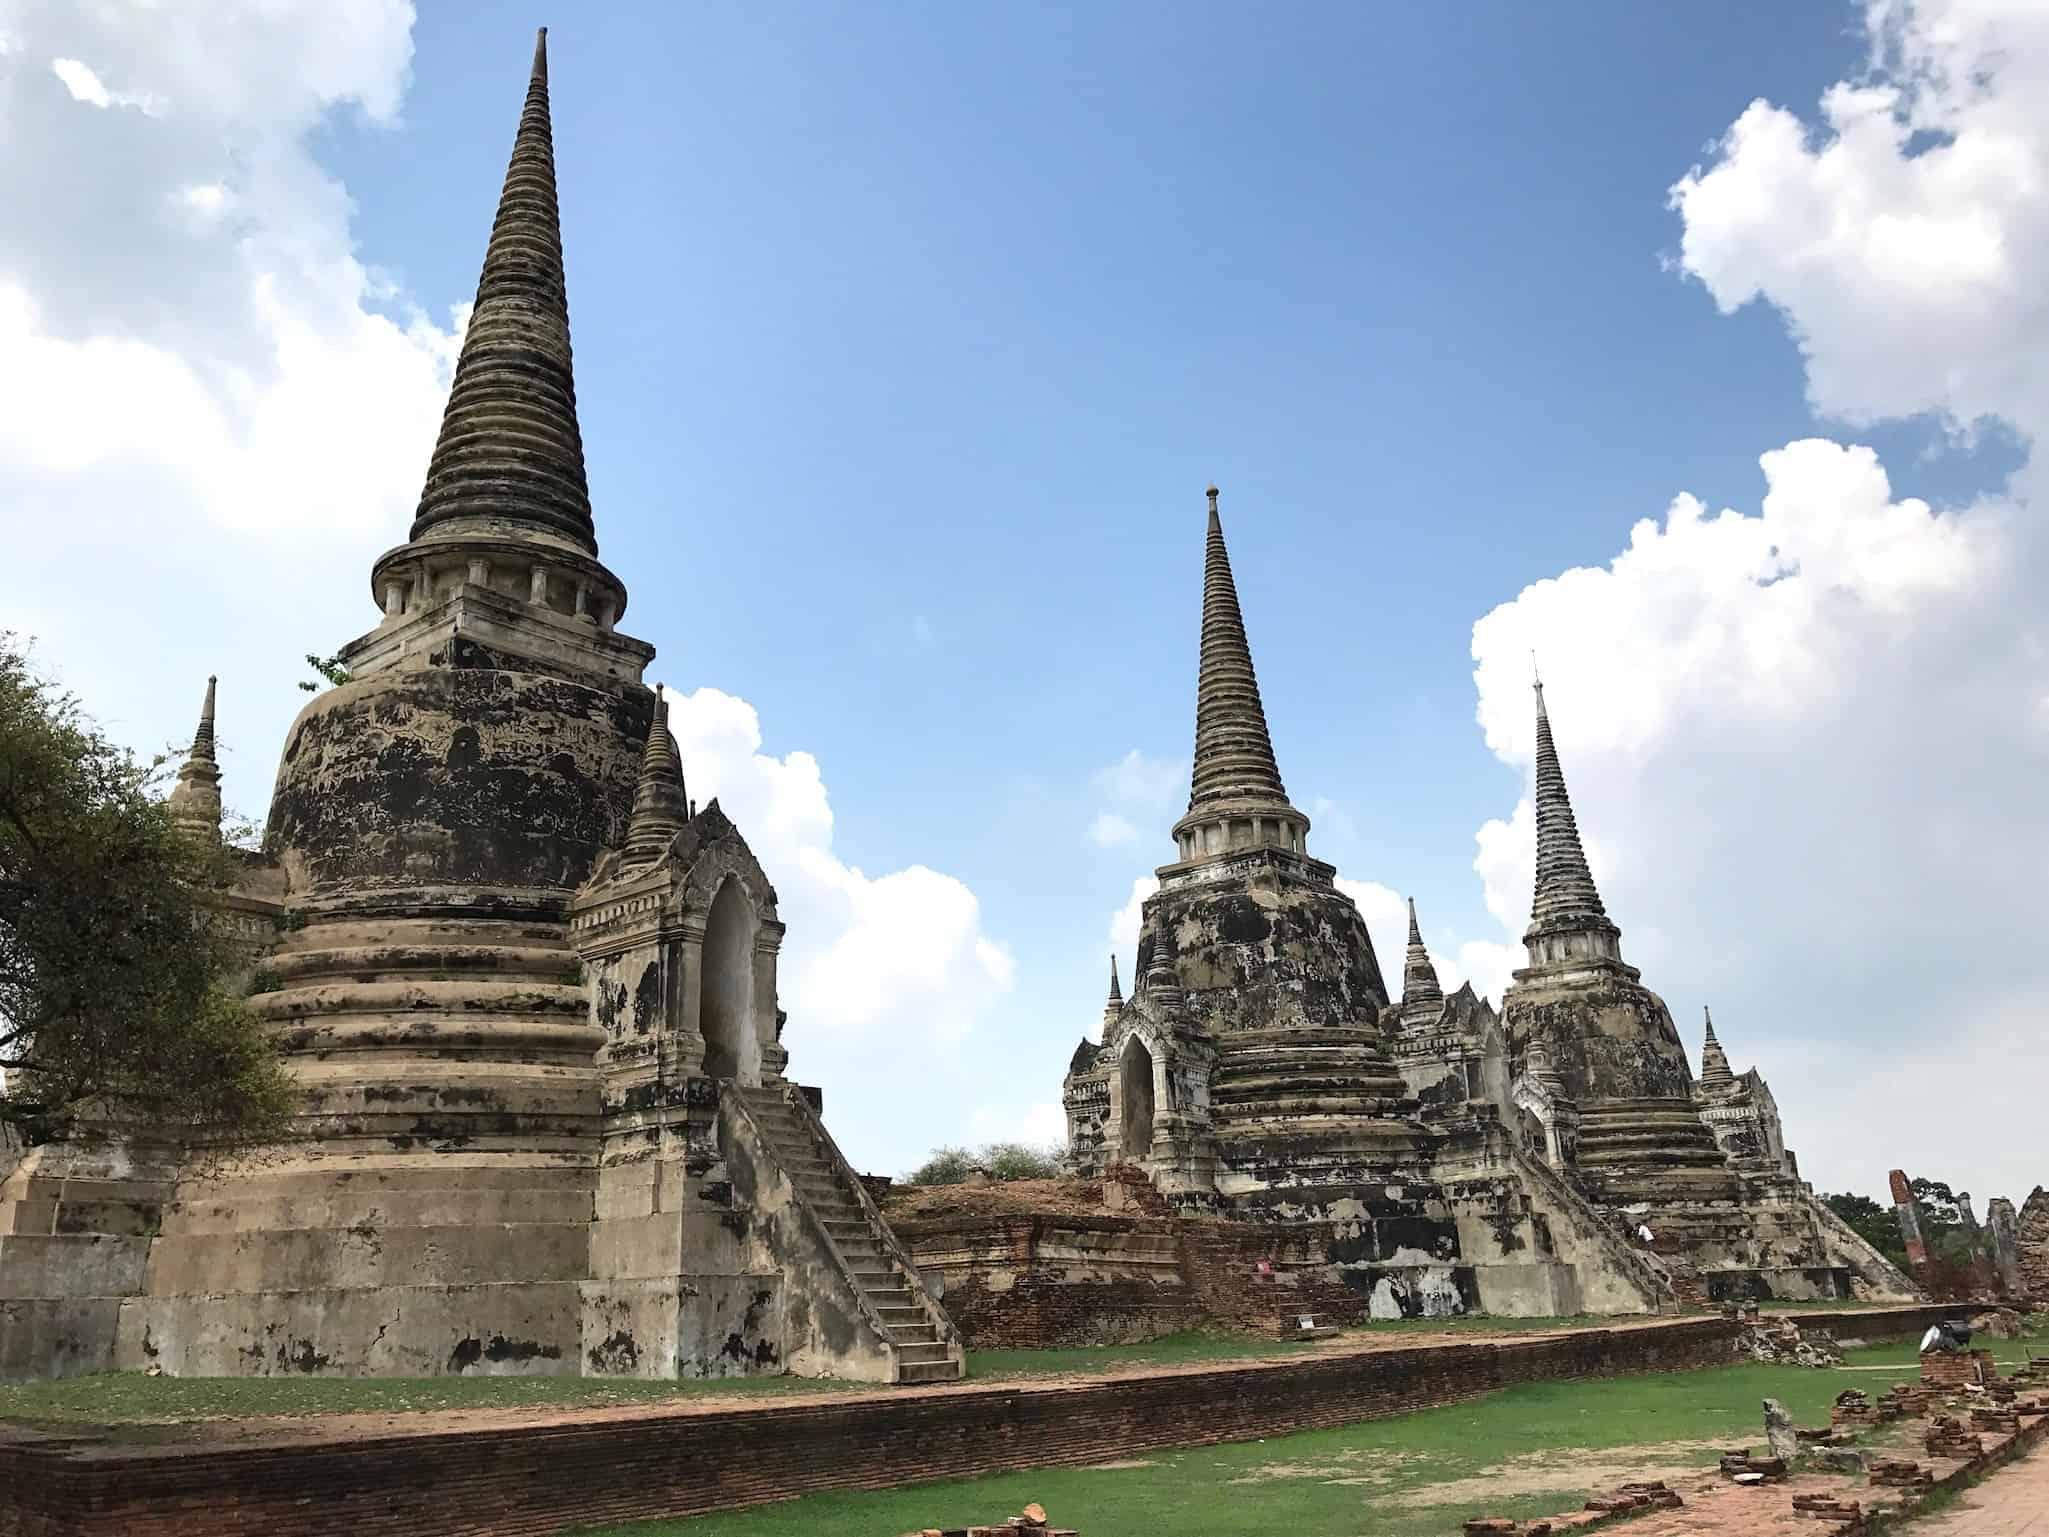 Wat Phra Si Sanphet Chedis